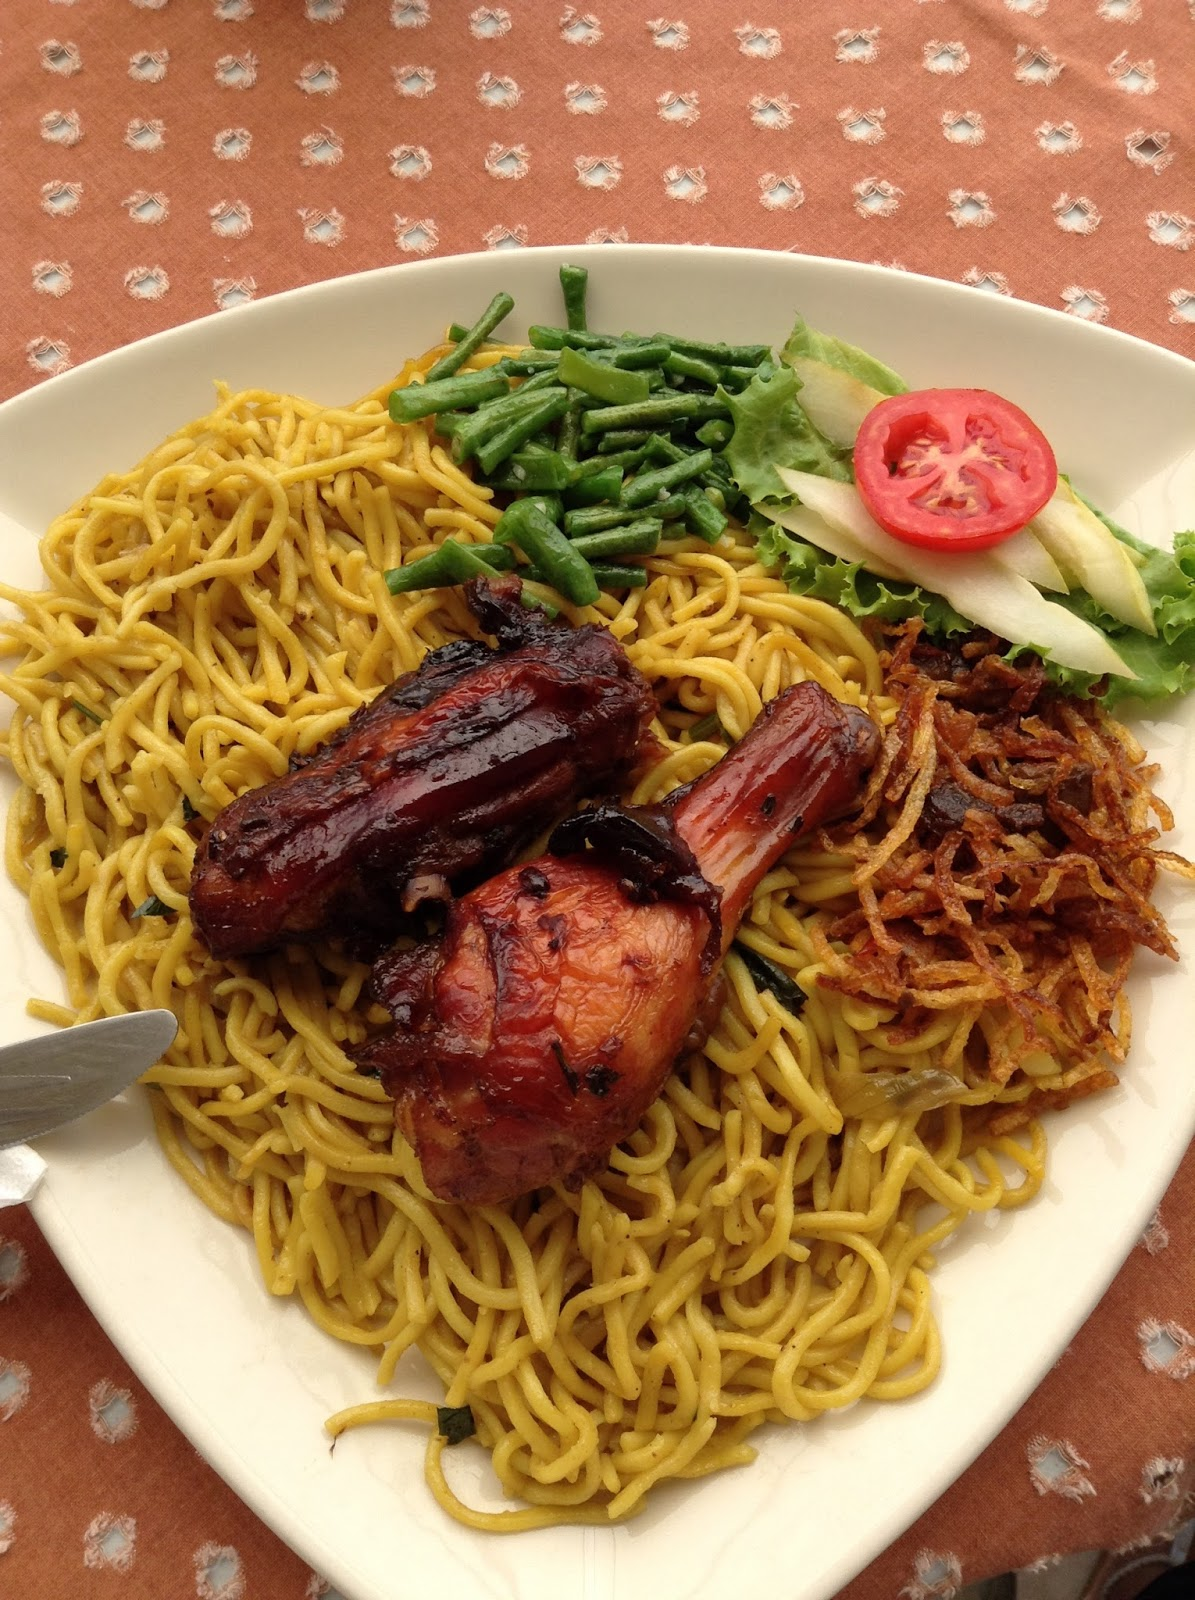 Bami Surinamese food